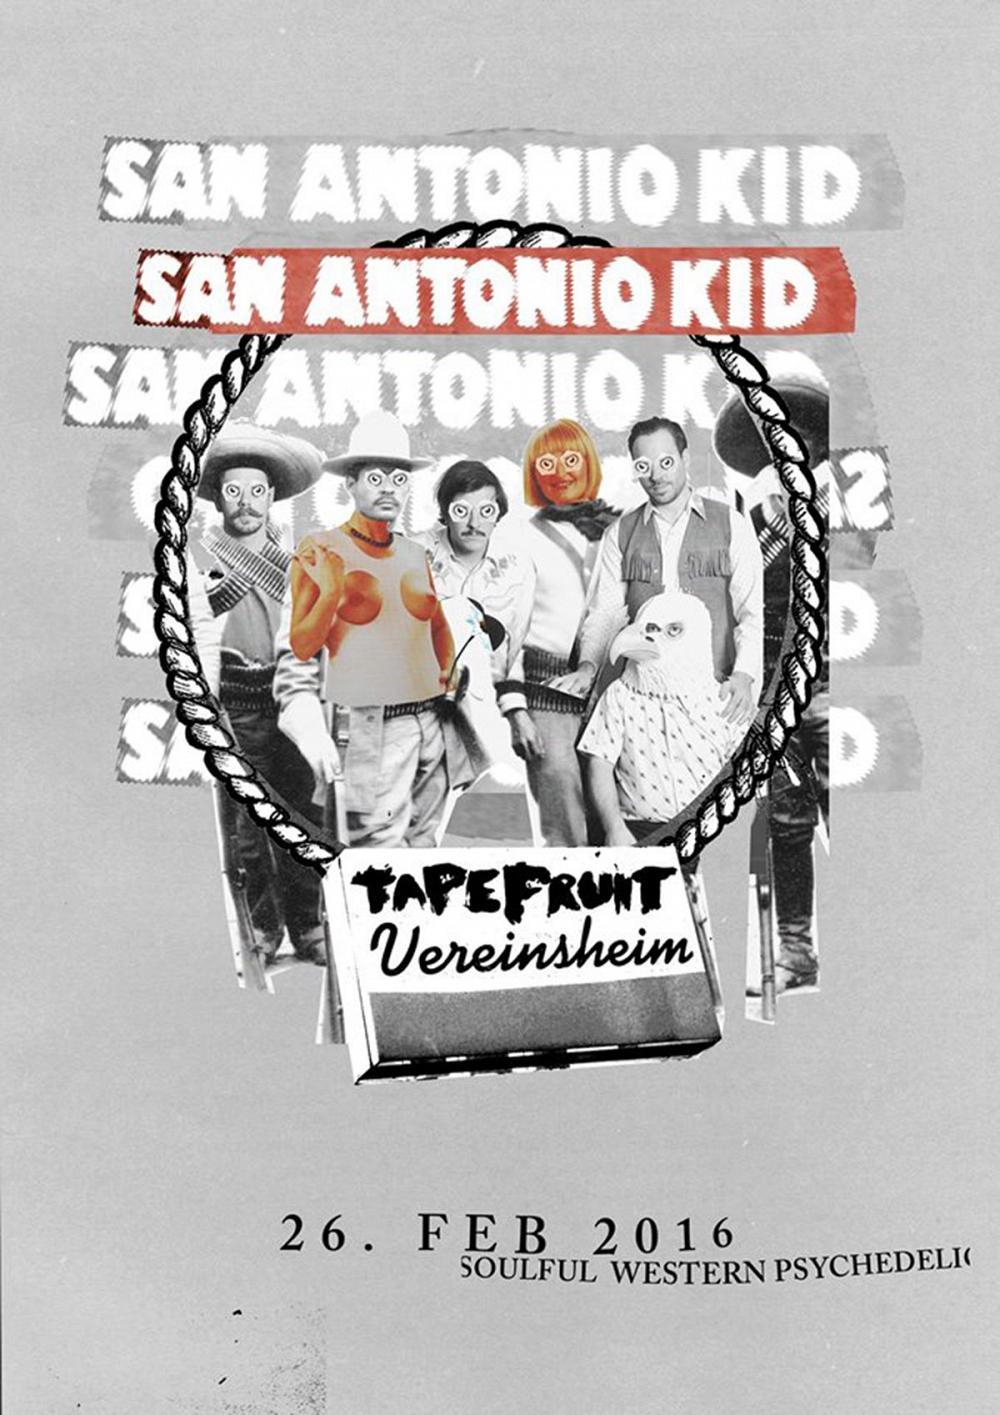 Tapefruit Konzert: San Antonio Kid | 26.02.2016 @ Vereinsheim